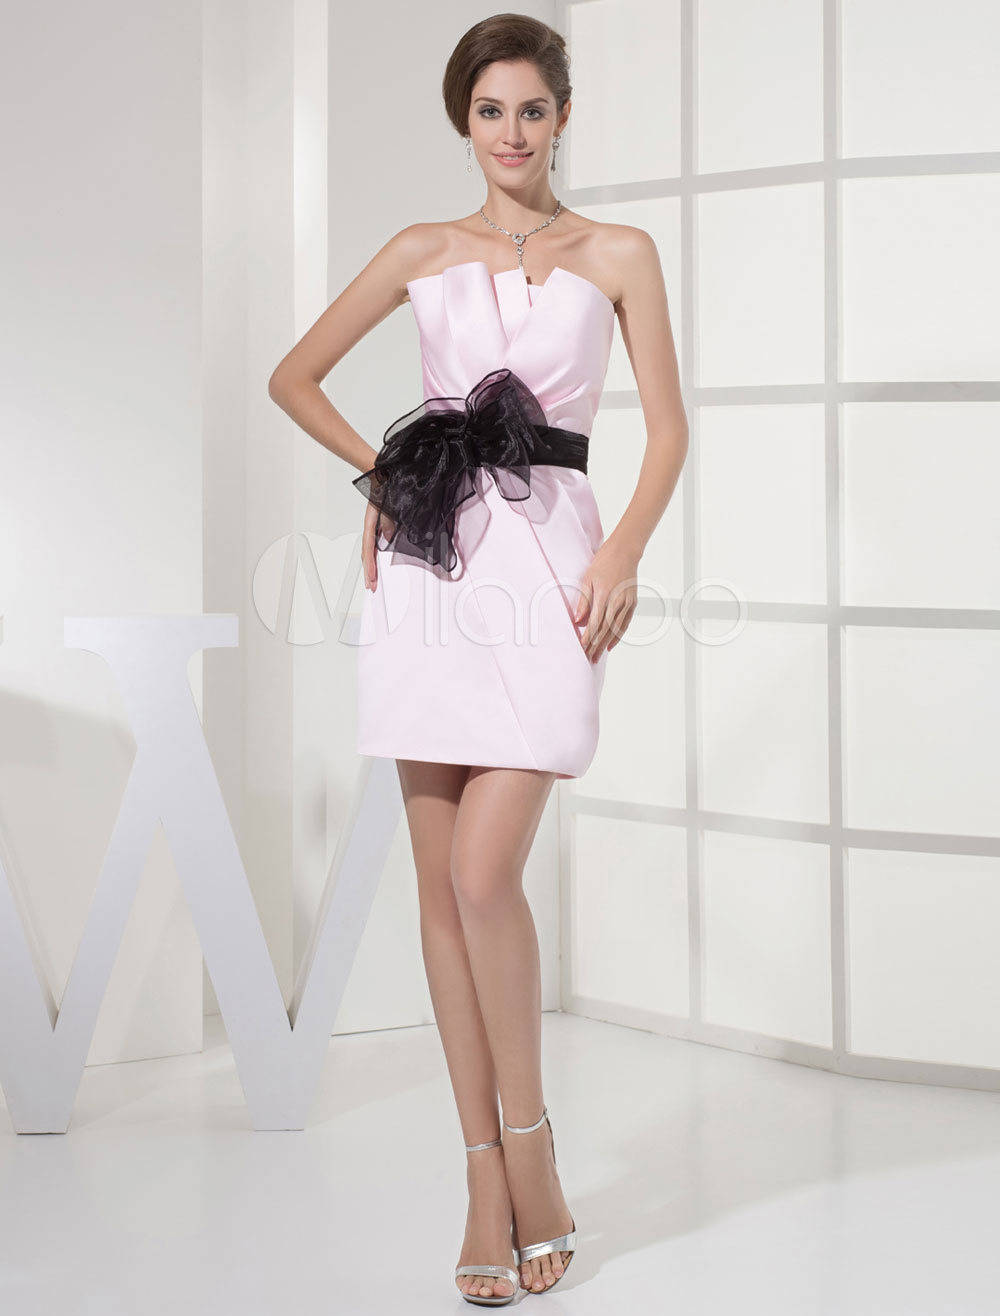 Short Prom Dress Strapless Pleated Sash Bow Sheath Cocktail Dress (Wedding Cheap Party Dress) photo